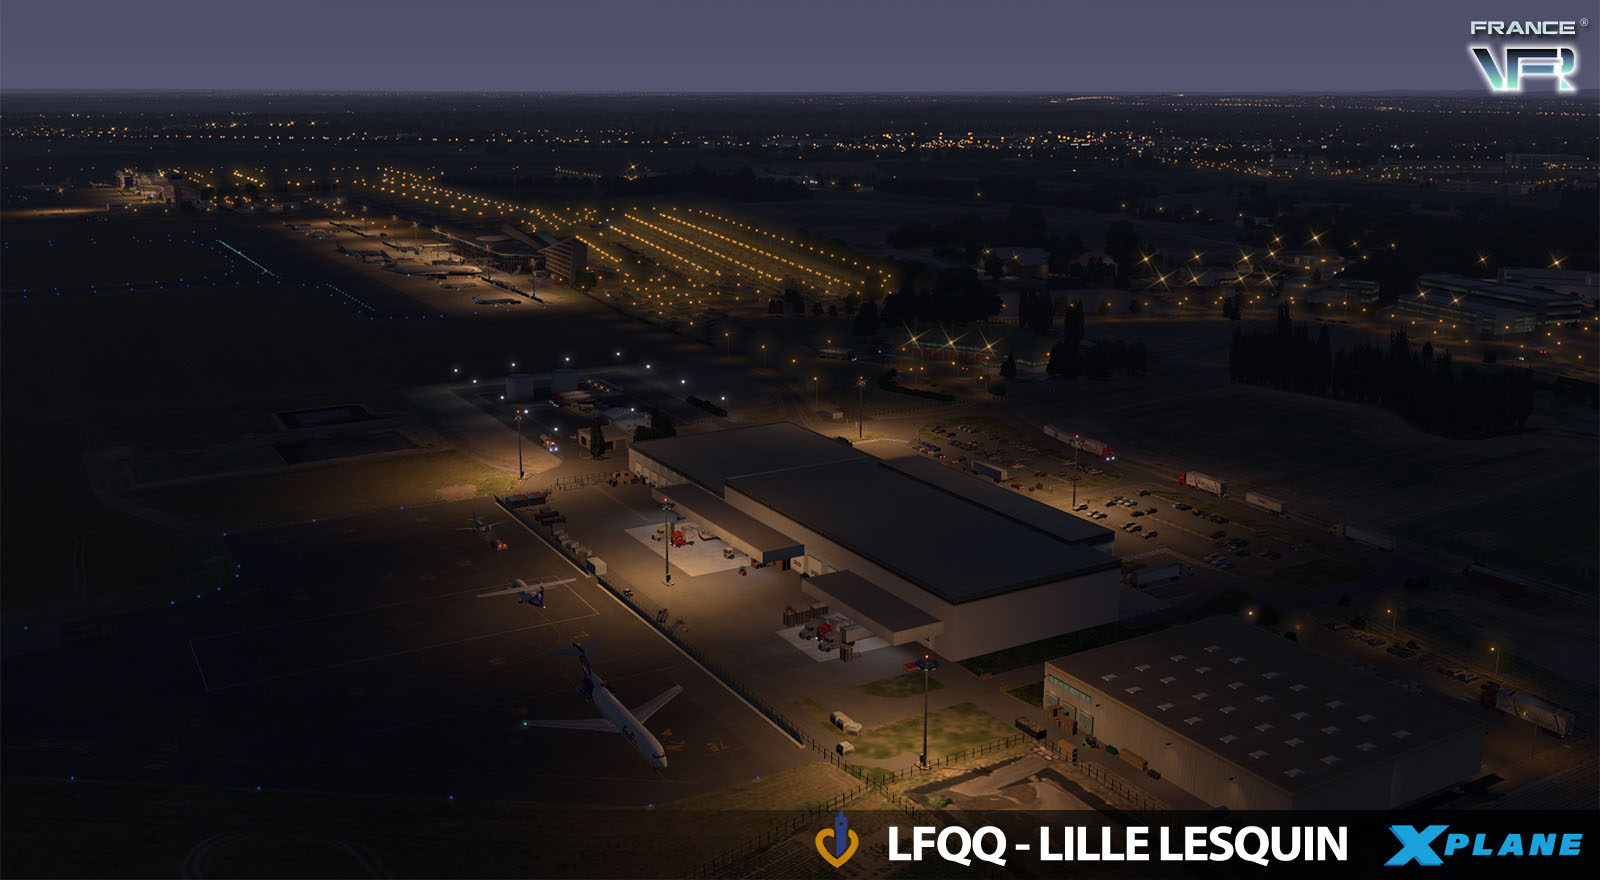 LFQQXP_41